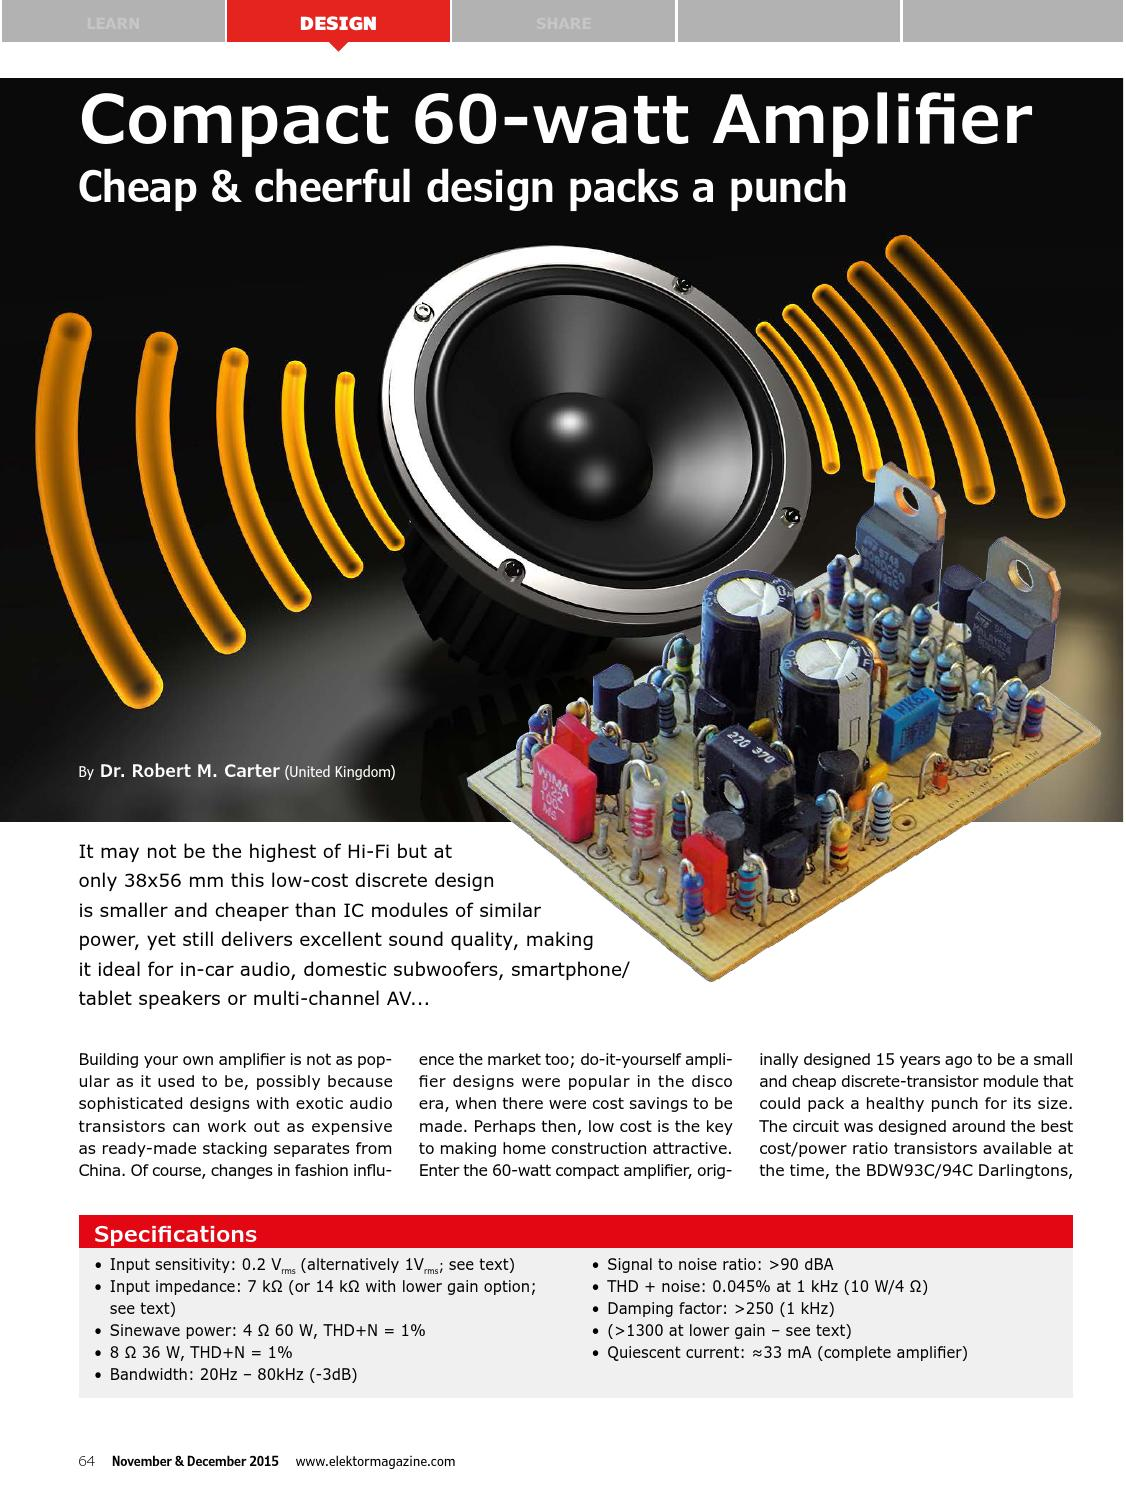 Elektor Edition 6 2015 By Issuu Small Transistor Amplifier Ideals